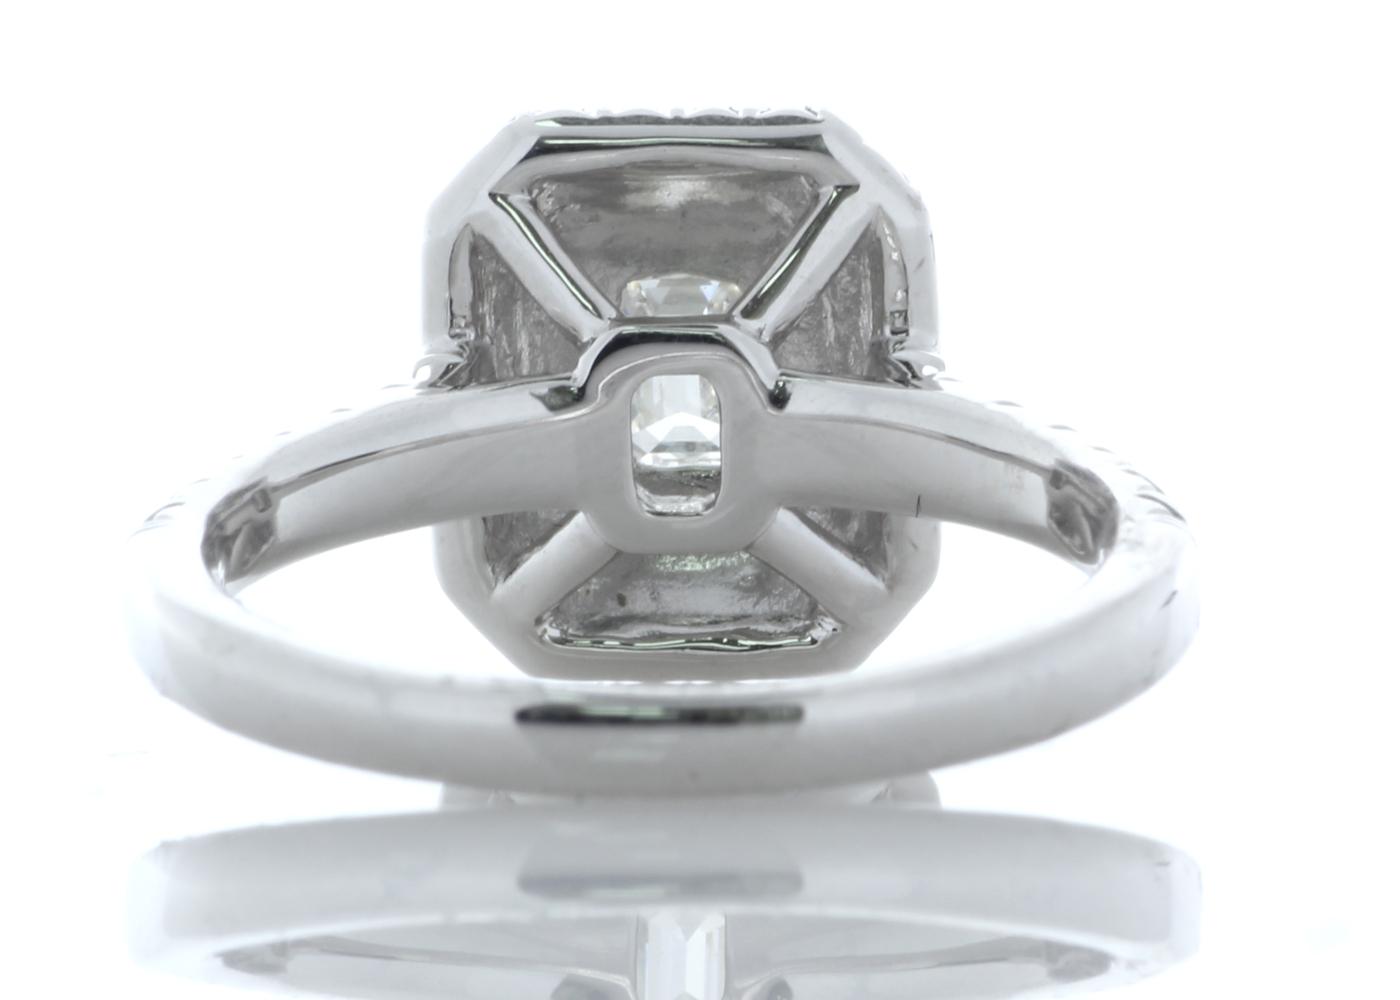 Platinum Single Stone With Halo Setting Ring 0.99 Carats - Image 3 of 4